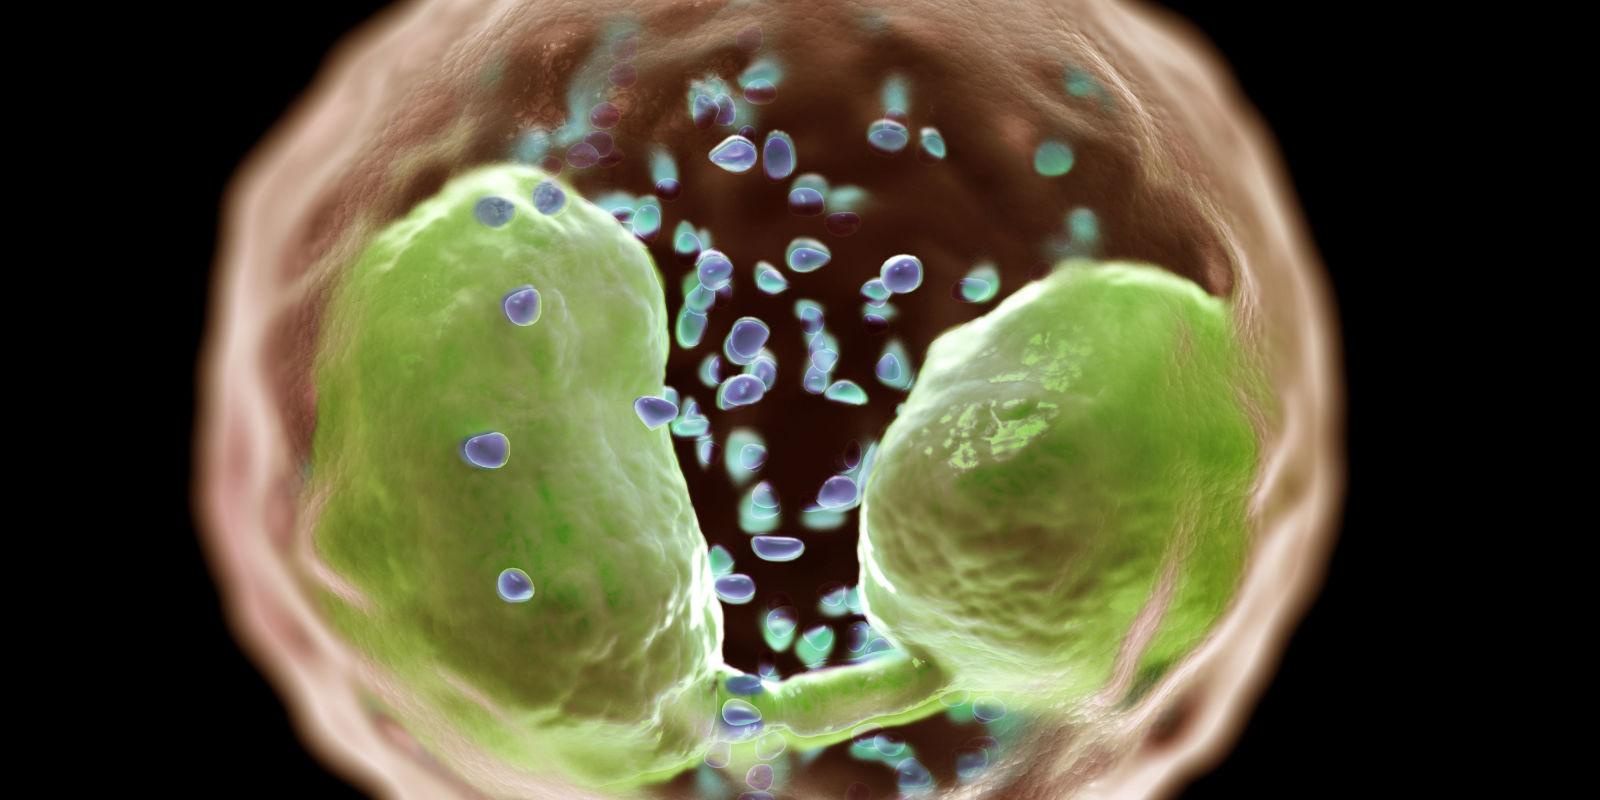 Eosinophilia